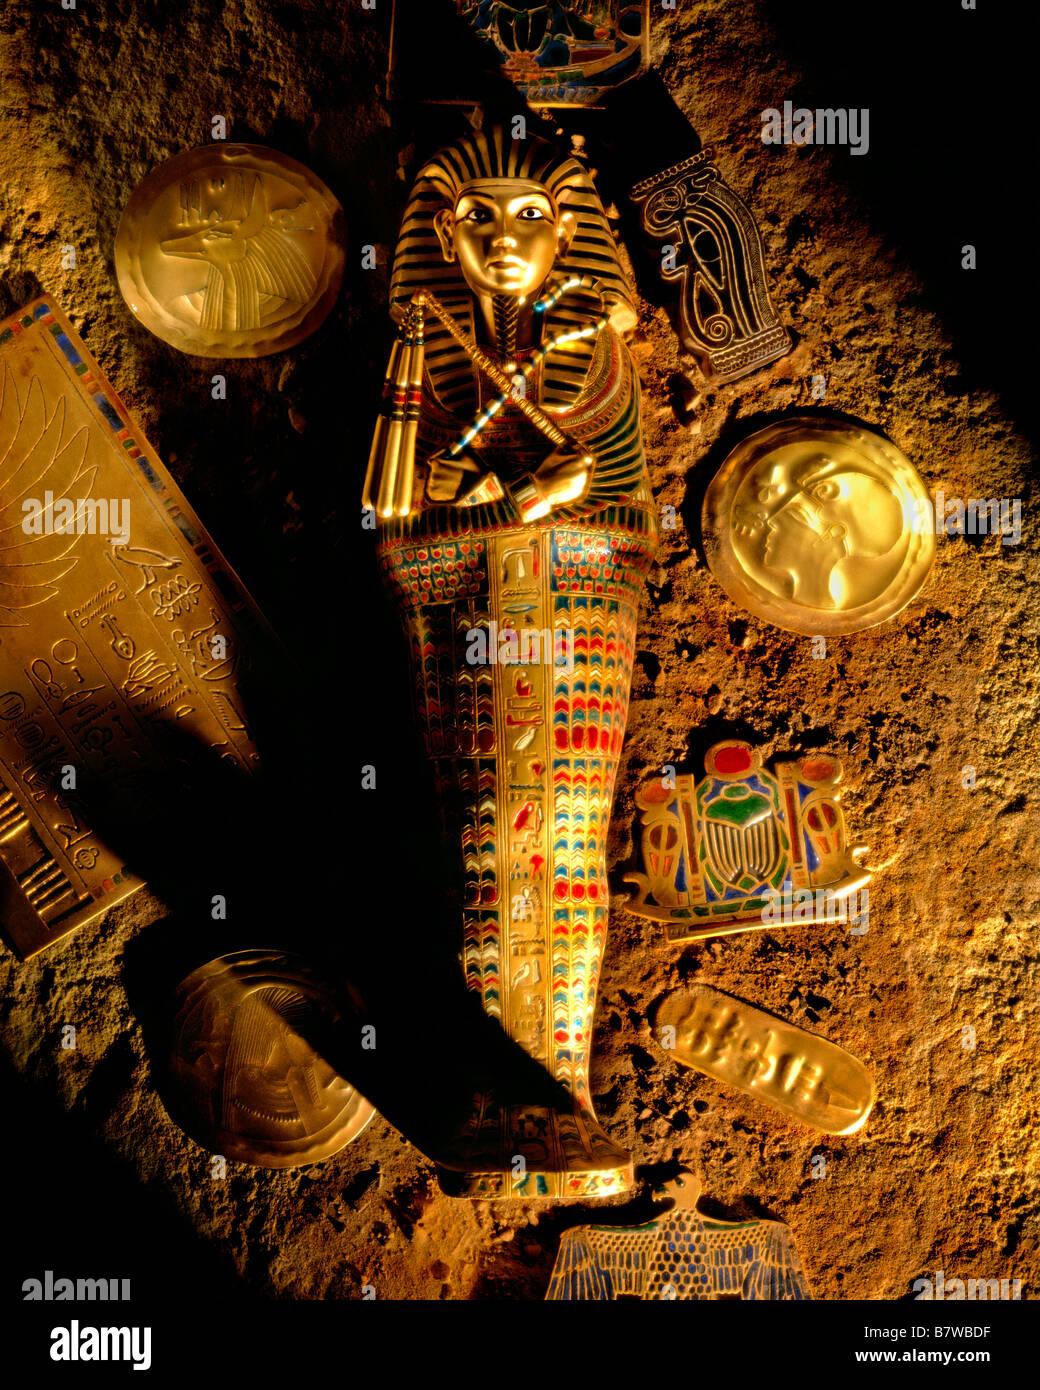 OVERHEAD SHOT OF TUTANKHAMUN TOMB - Stock Image